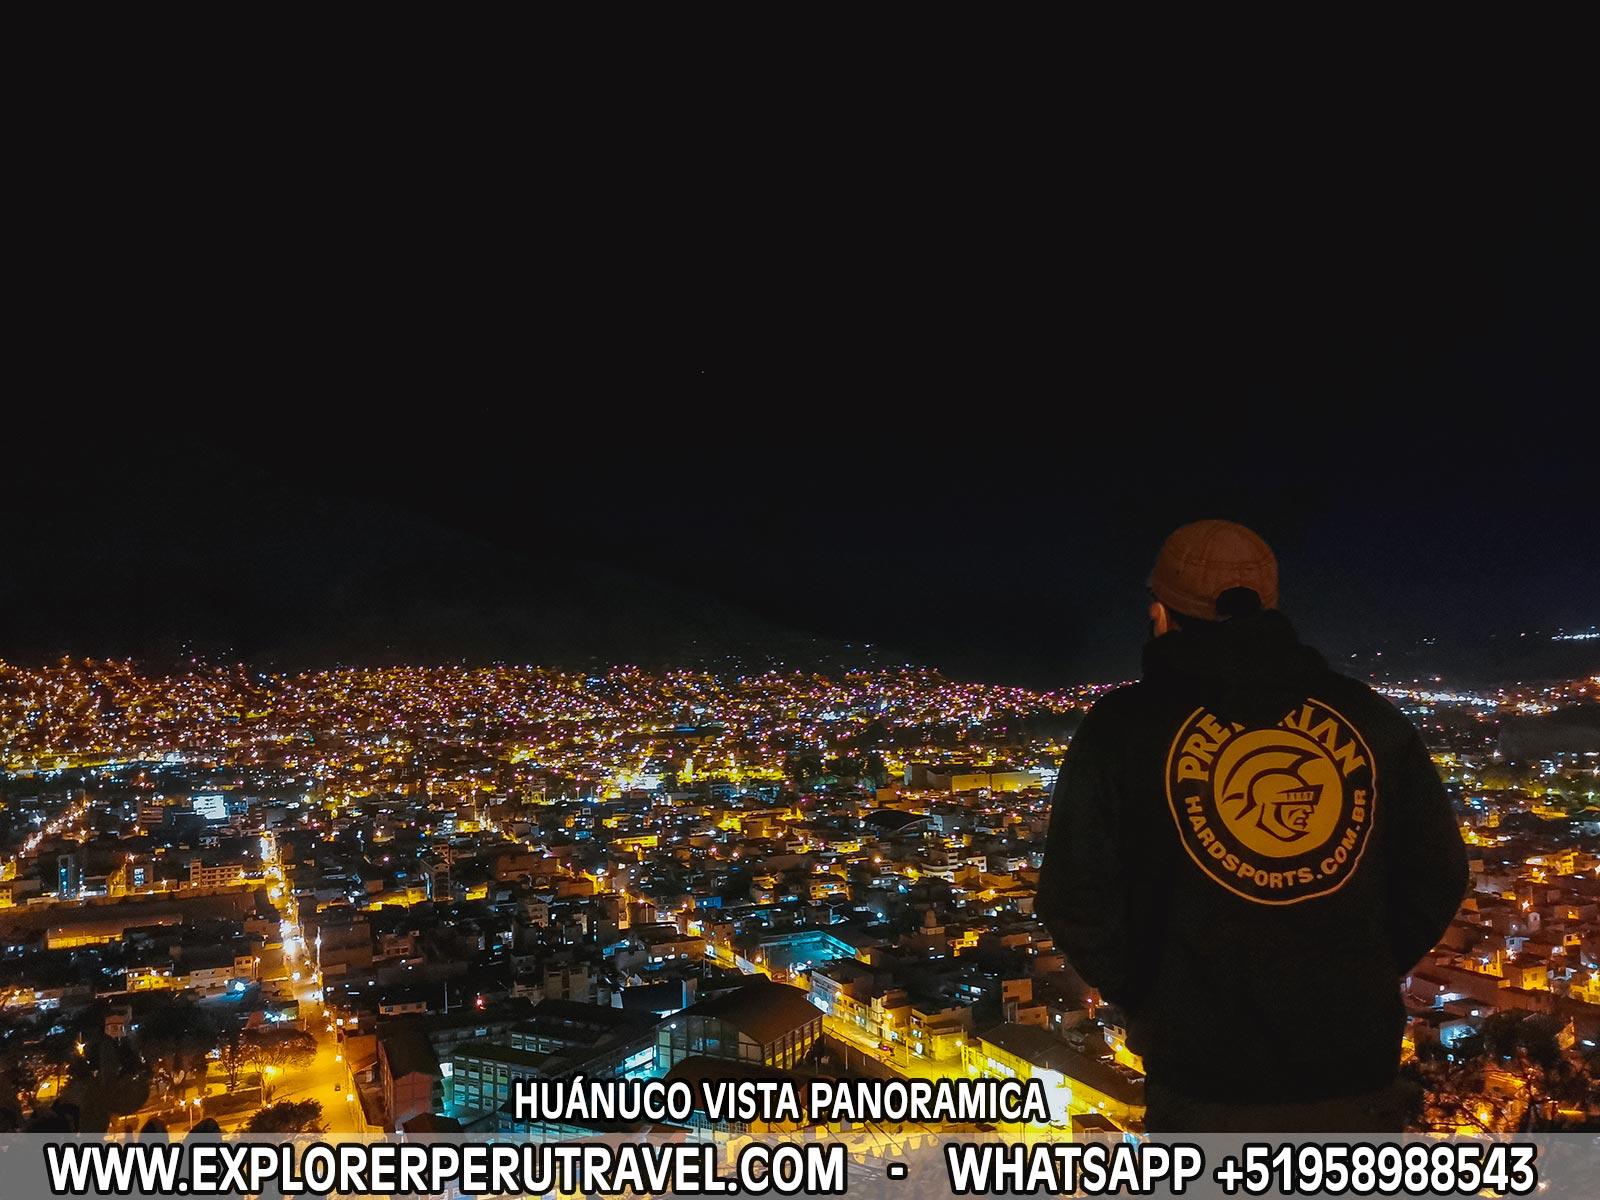 HUÁNUCO DE NOCHES VISTA PANORAMICA